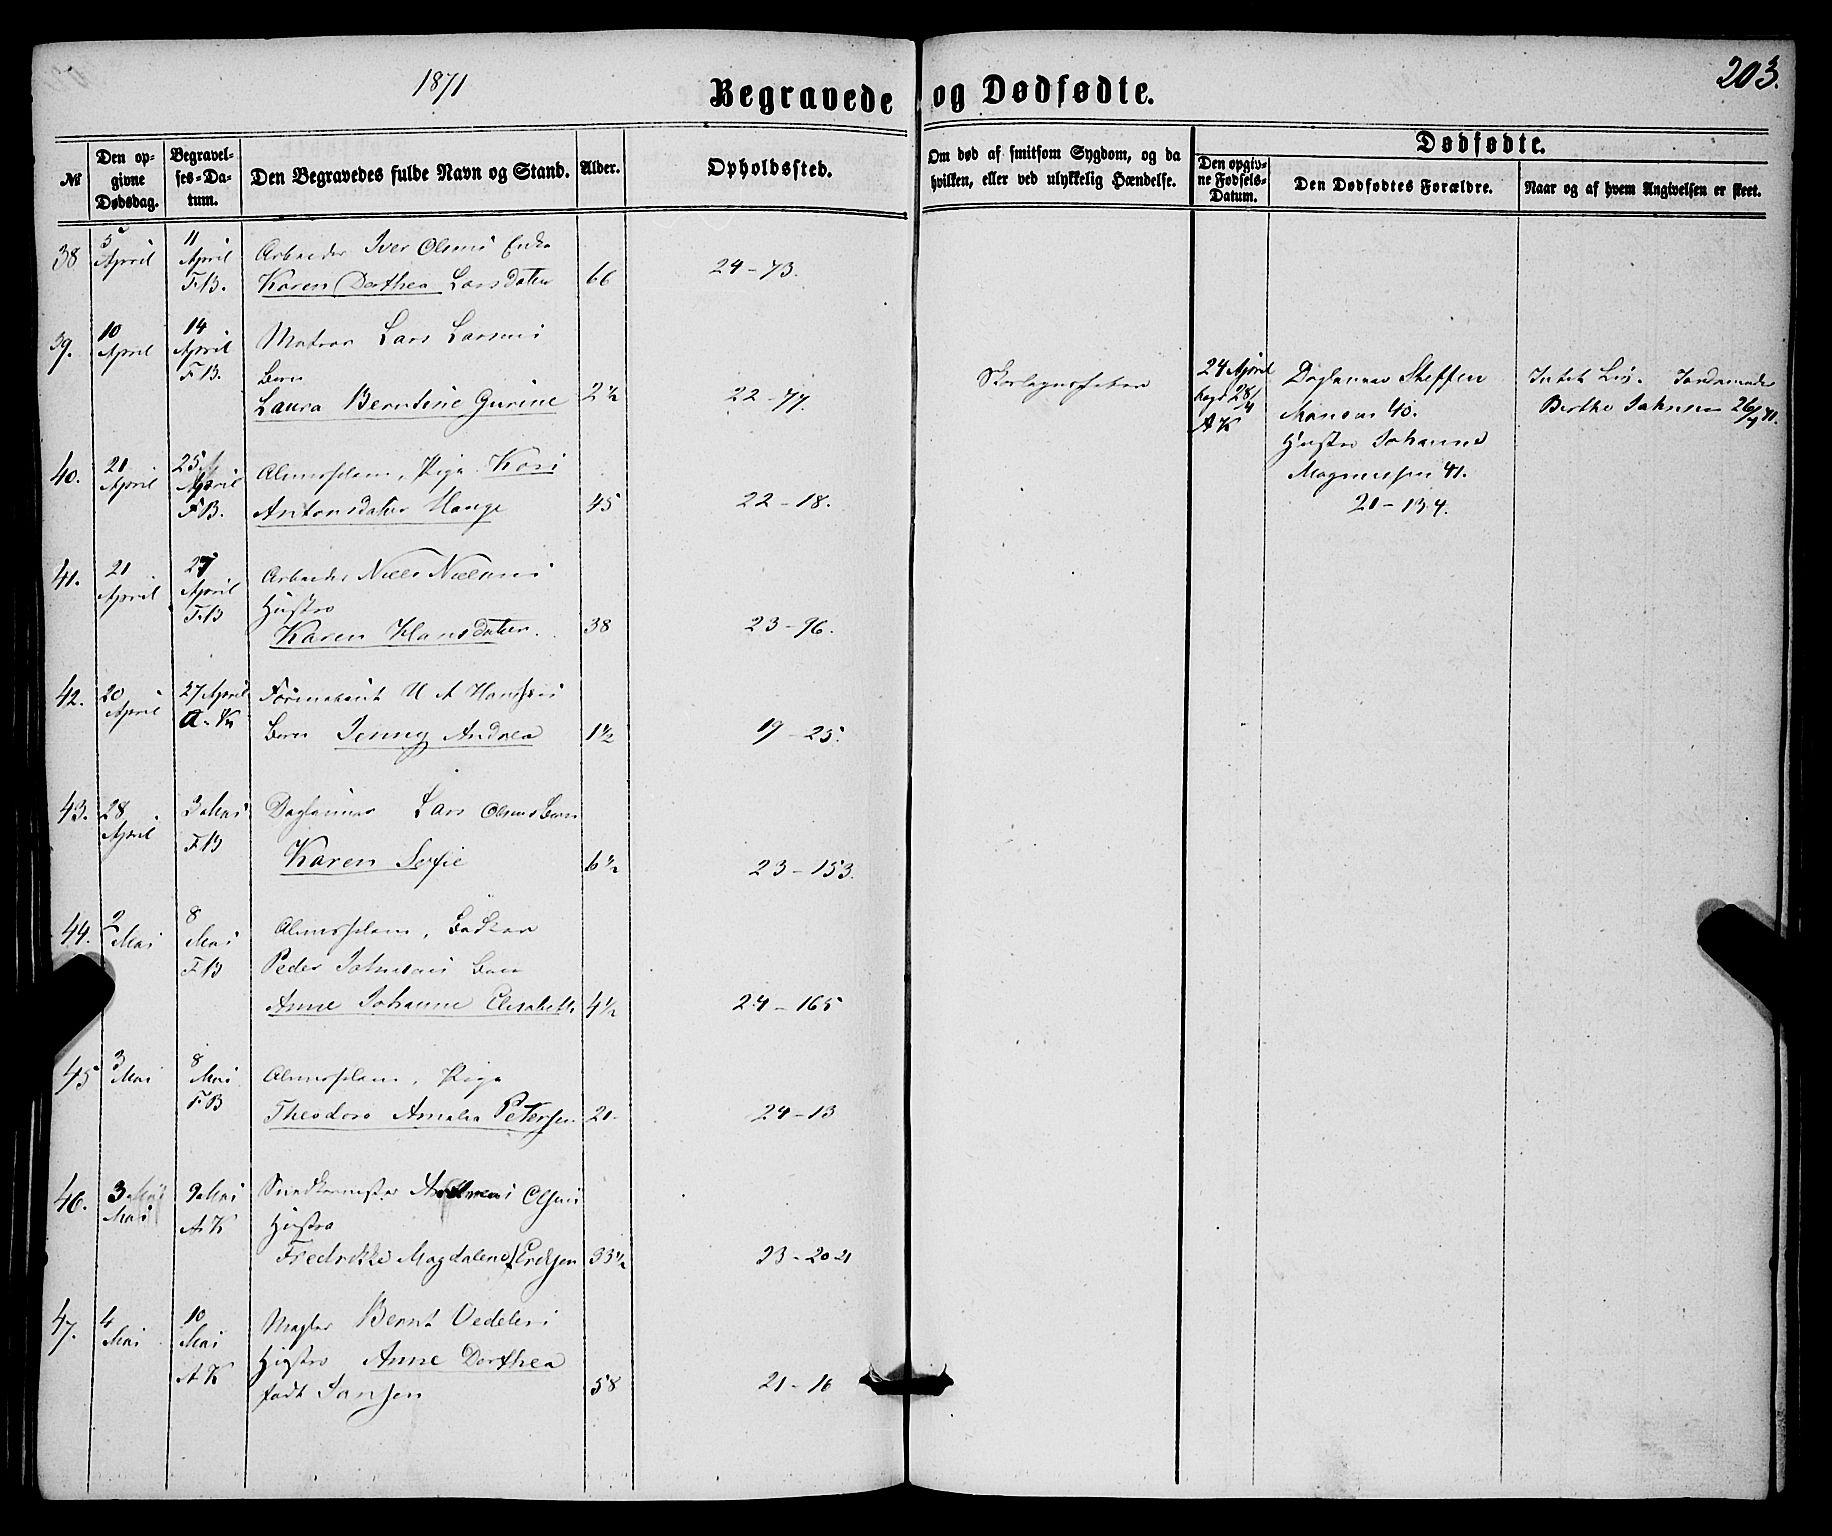 SAB, Korskirken Sokneprestembete, H/Haa/L0045: Parish register (official) no. E 3, 1863-1875, p. 203